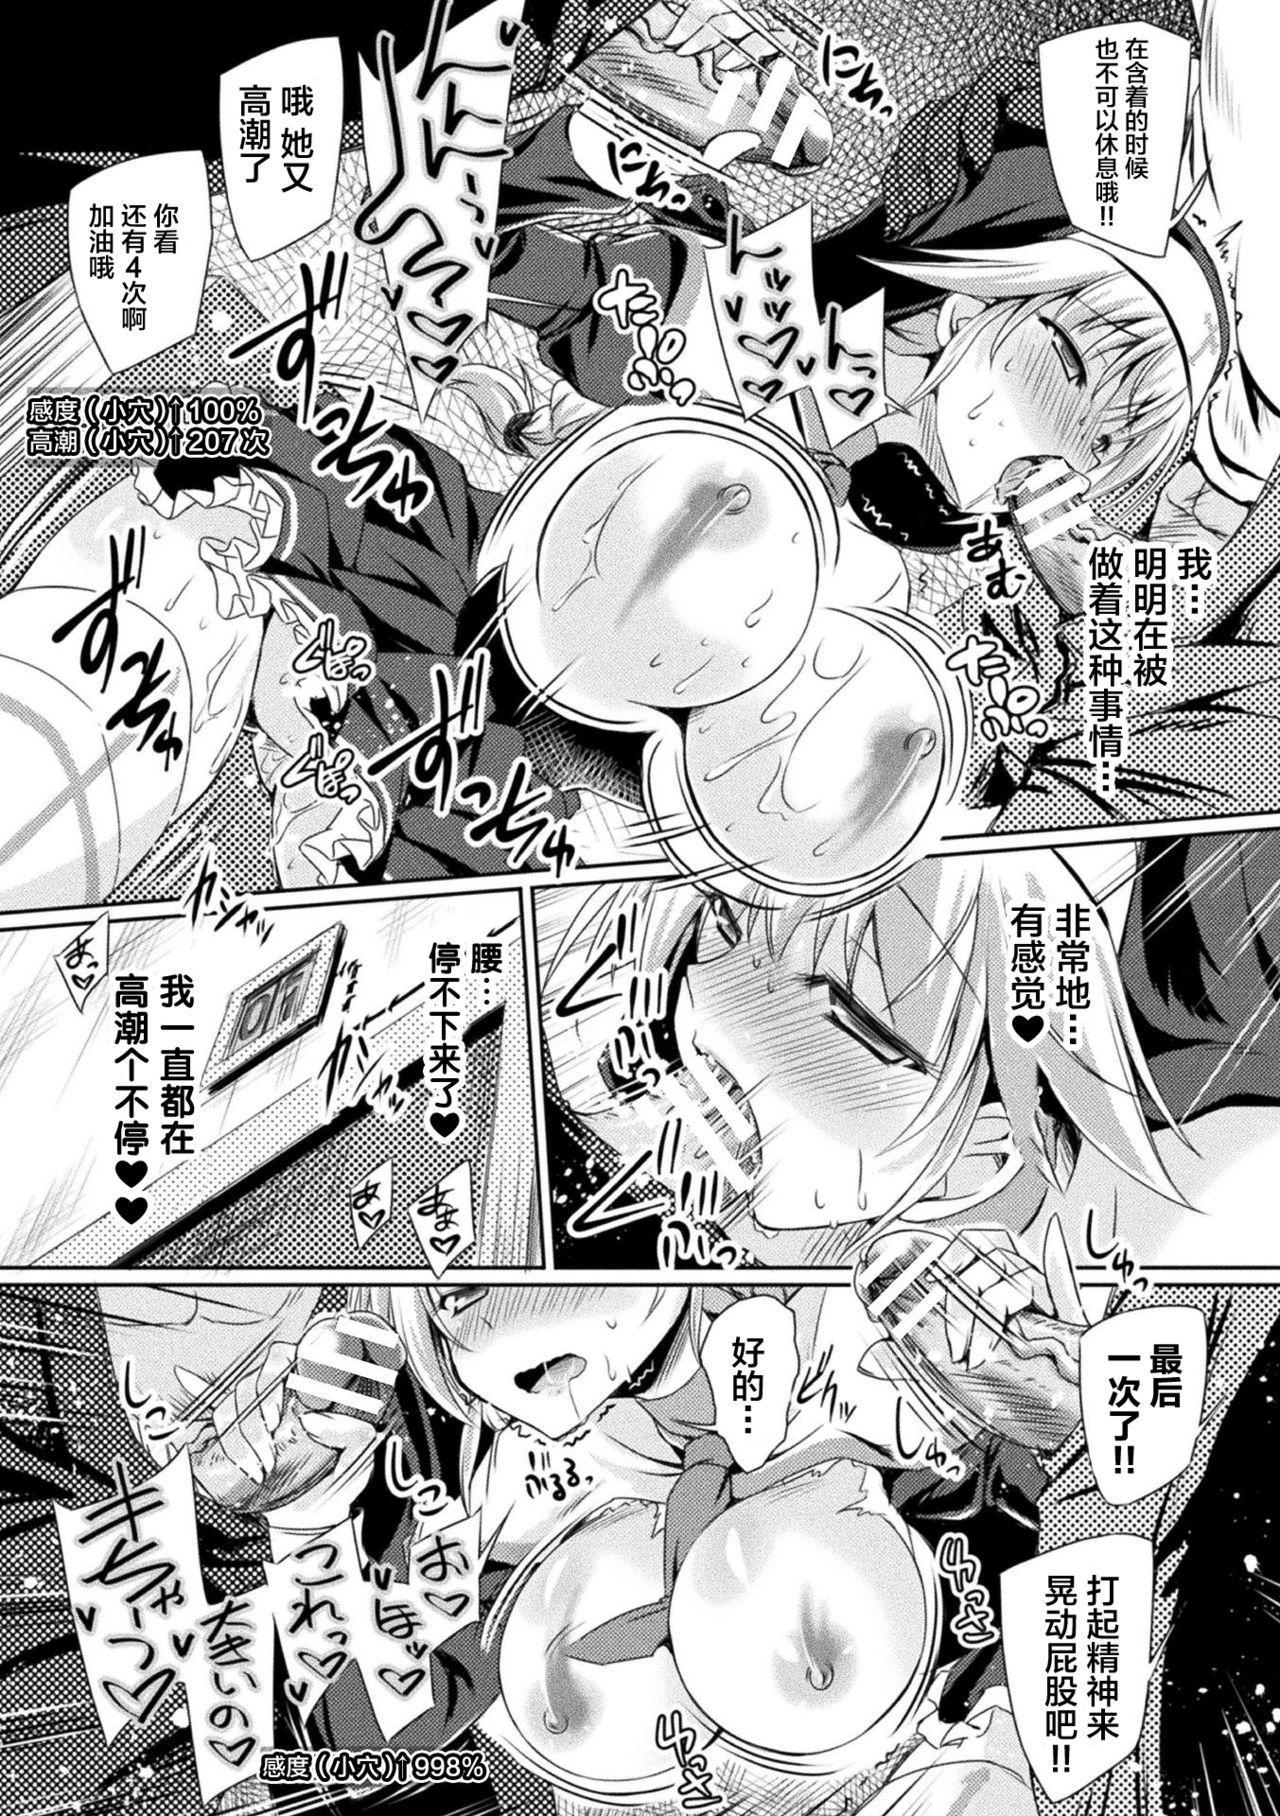 2D Comic Magazine Zecchou Kairaku ga Tomaranai Ero-Trap Dungeon Vol. 1 37